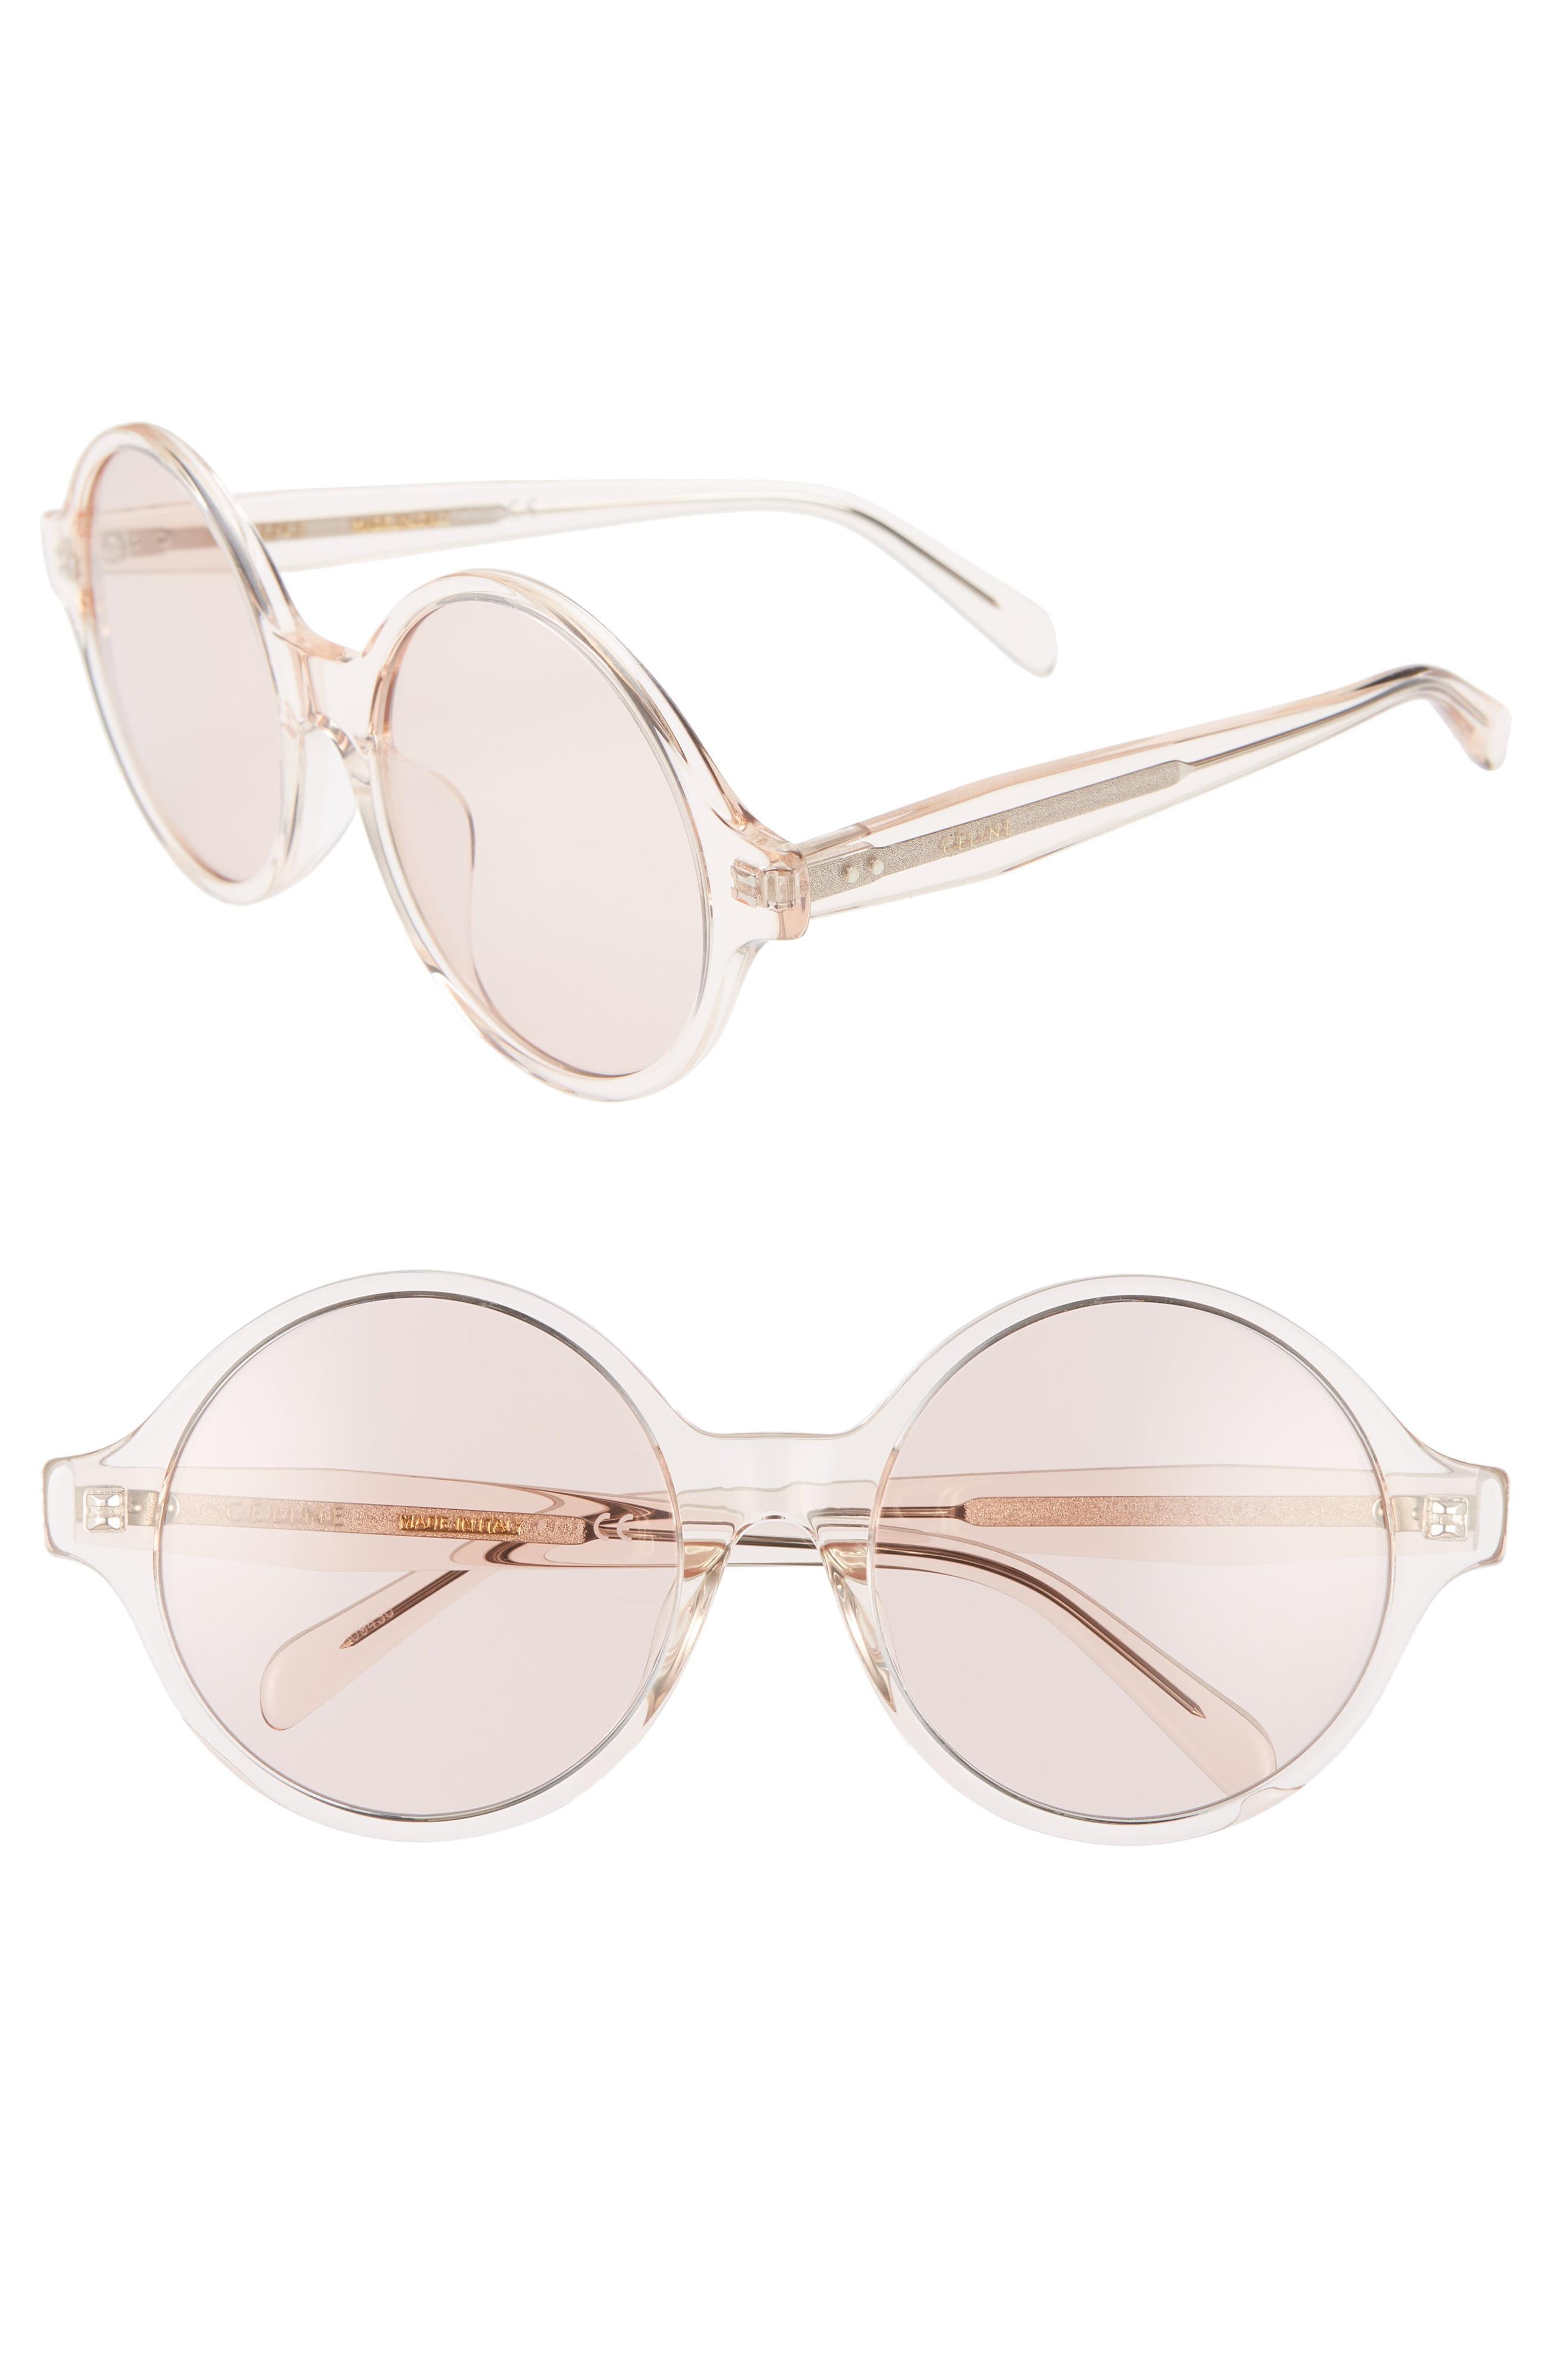 7db10fb7f6 Lyst - Céline 58mm Round Sunglasses - Transparent Light Rose  Pink ...